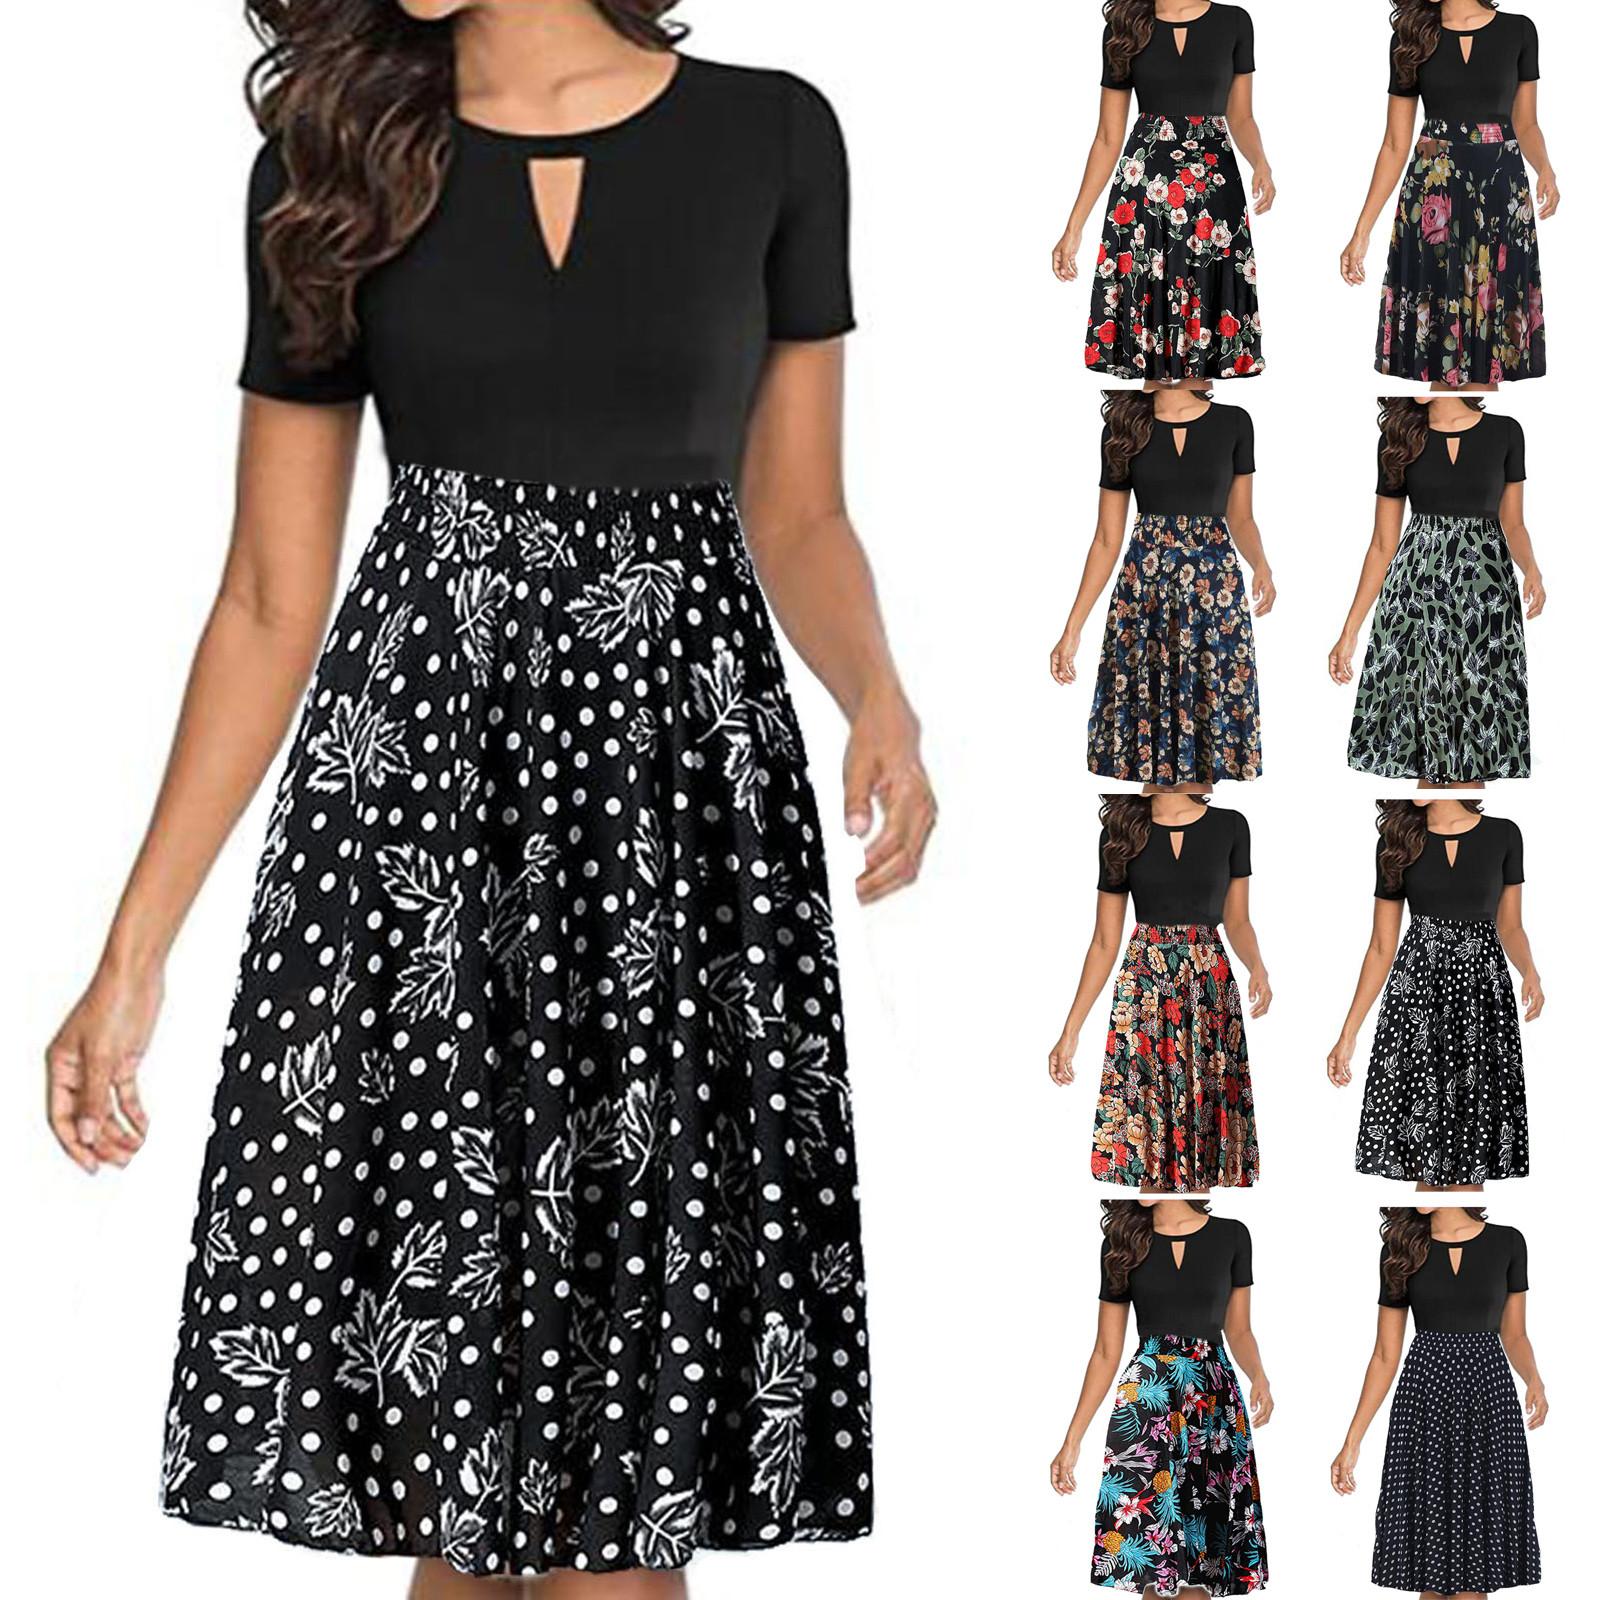 Plus Size Vintage Dress Women's Floral Printed High Waist Pleated A line Swing Dress Bohe Patchwork Dot Floral Dresses Платье